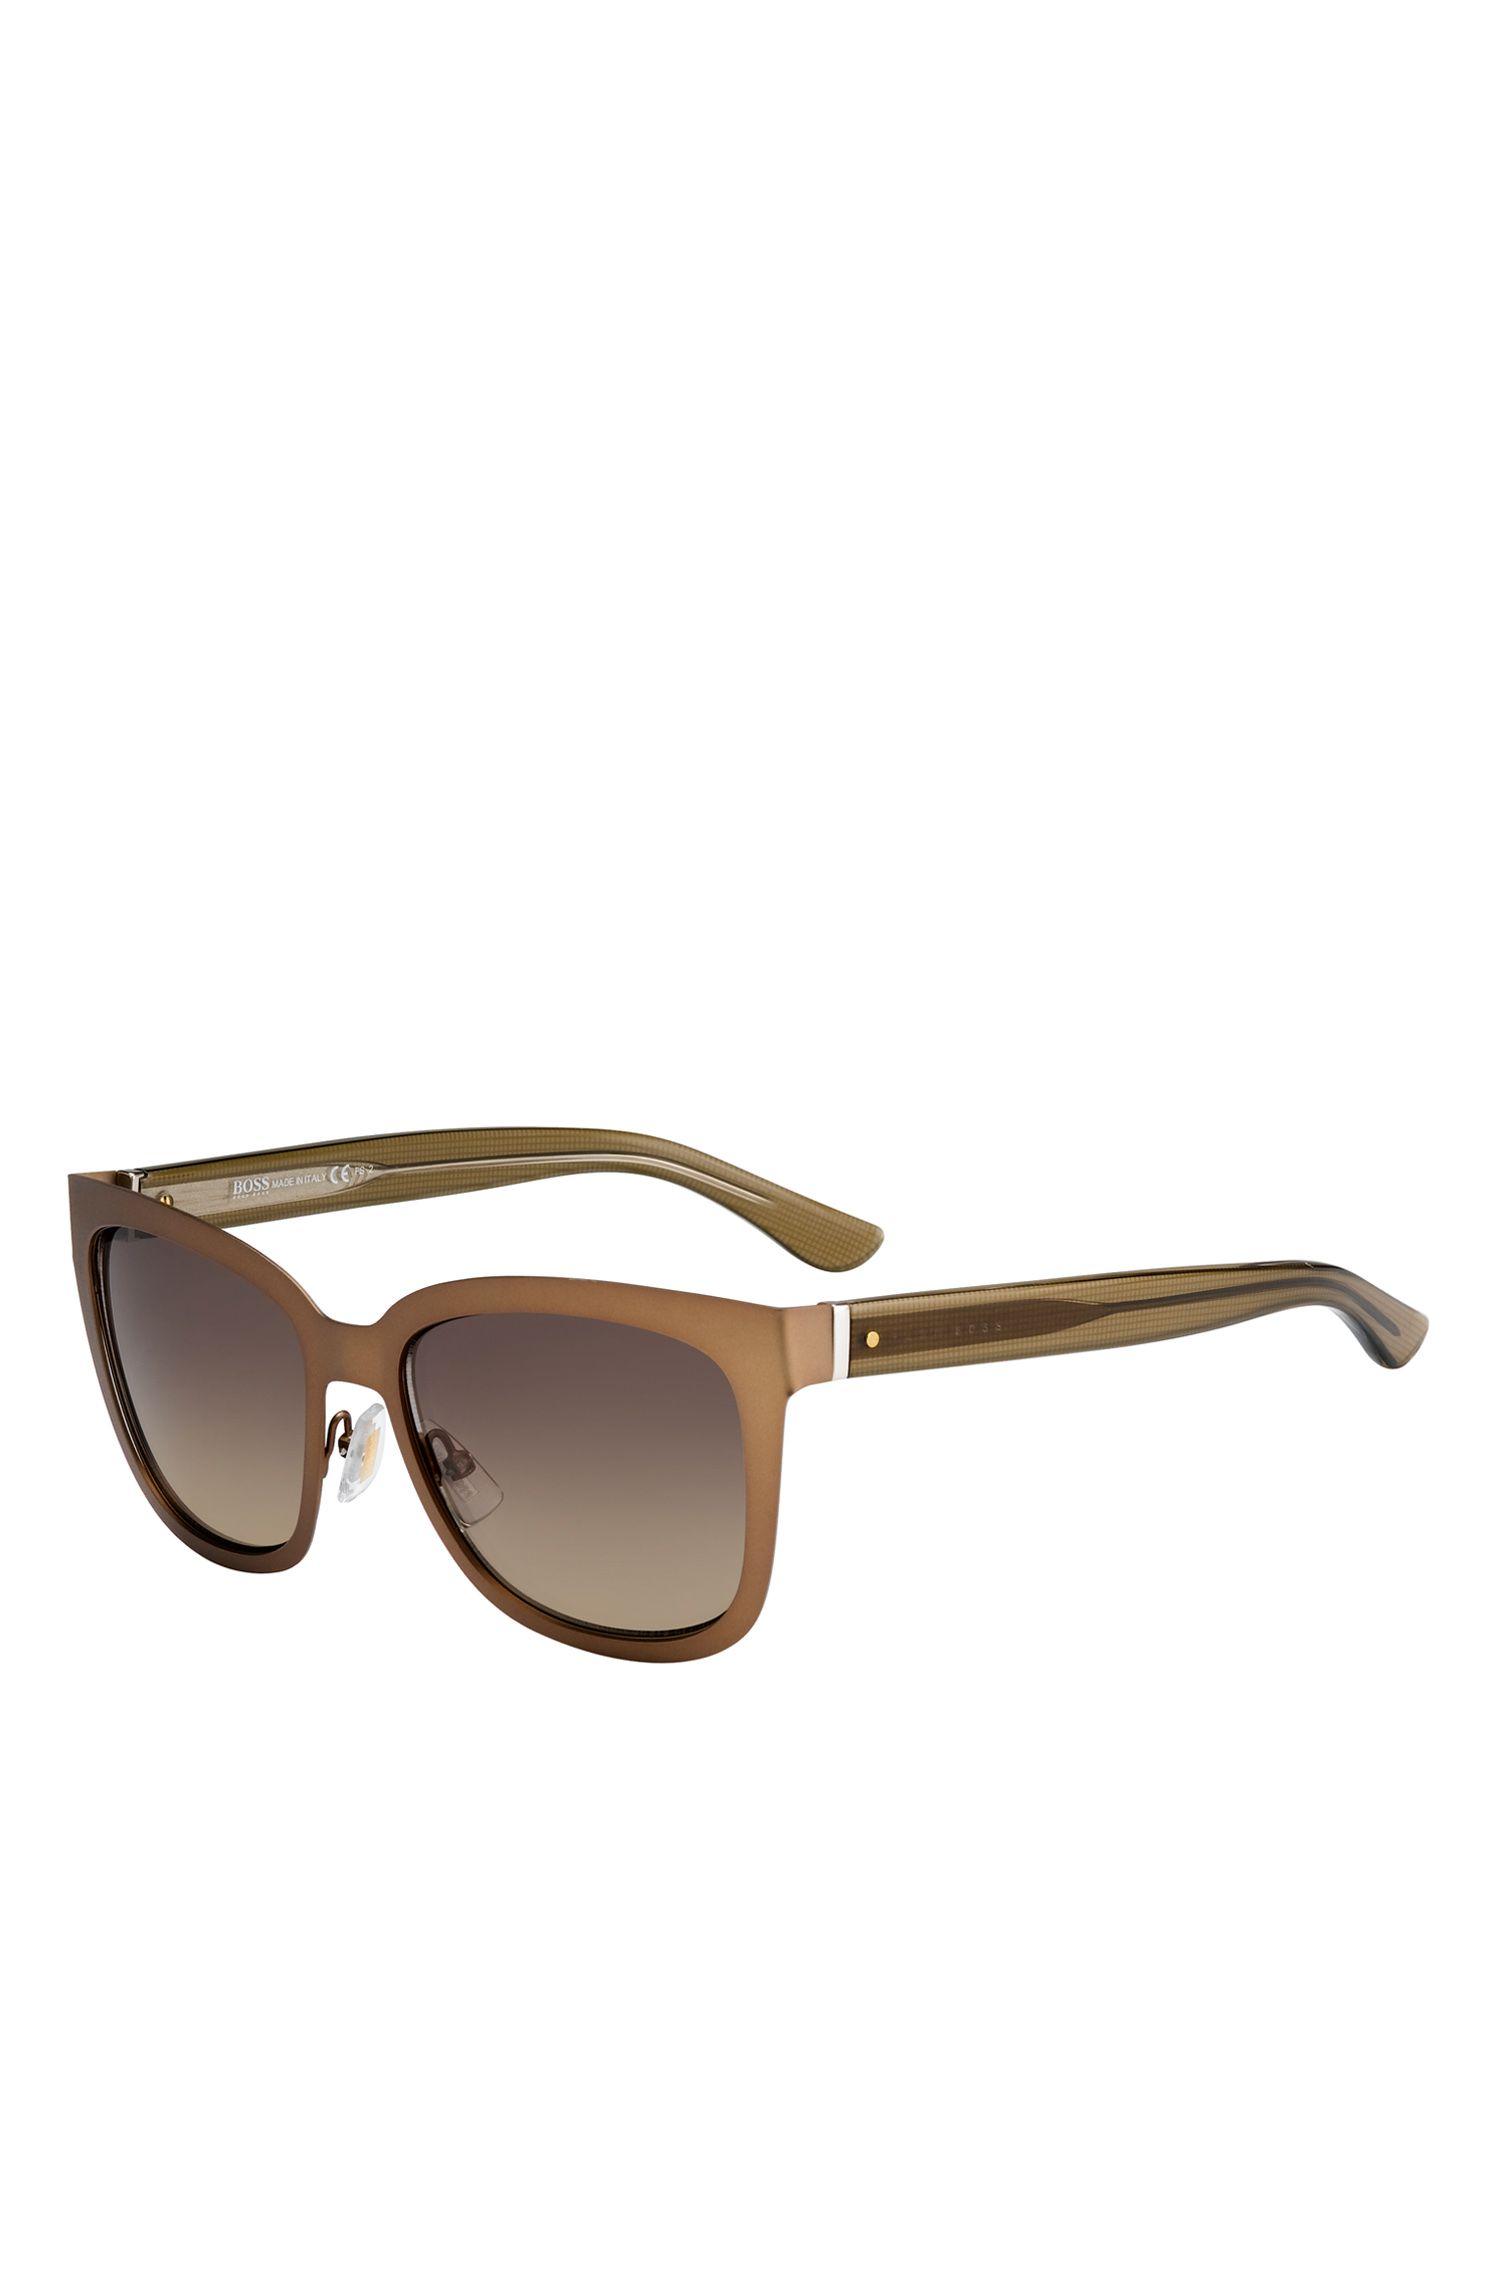 'BOSS 676S' | Brown Gradient Lens Rectangular Sunglasses